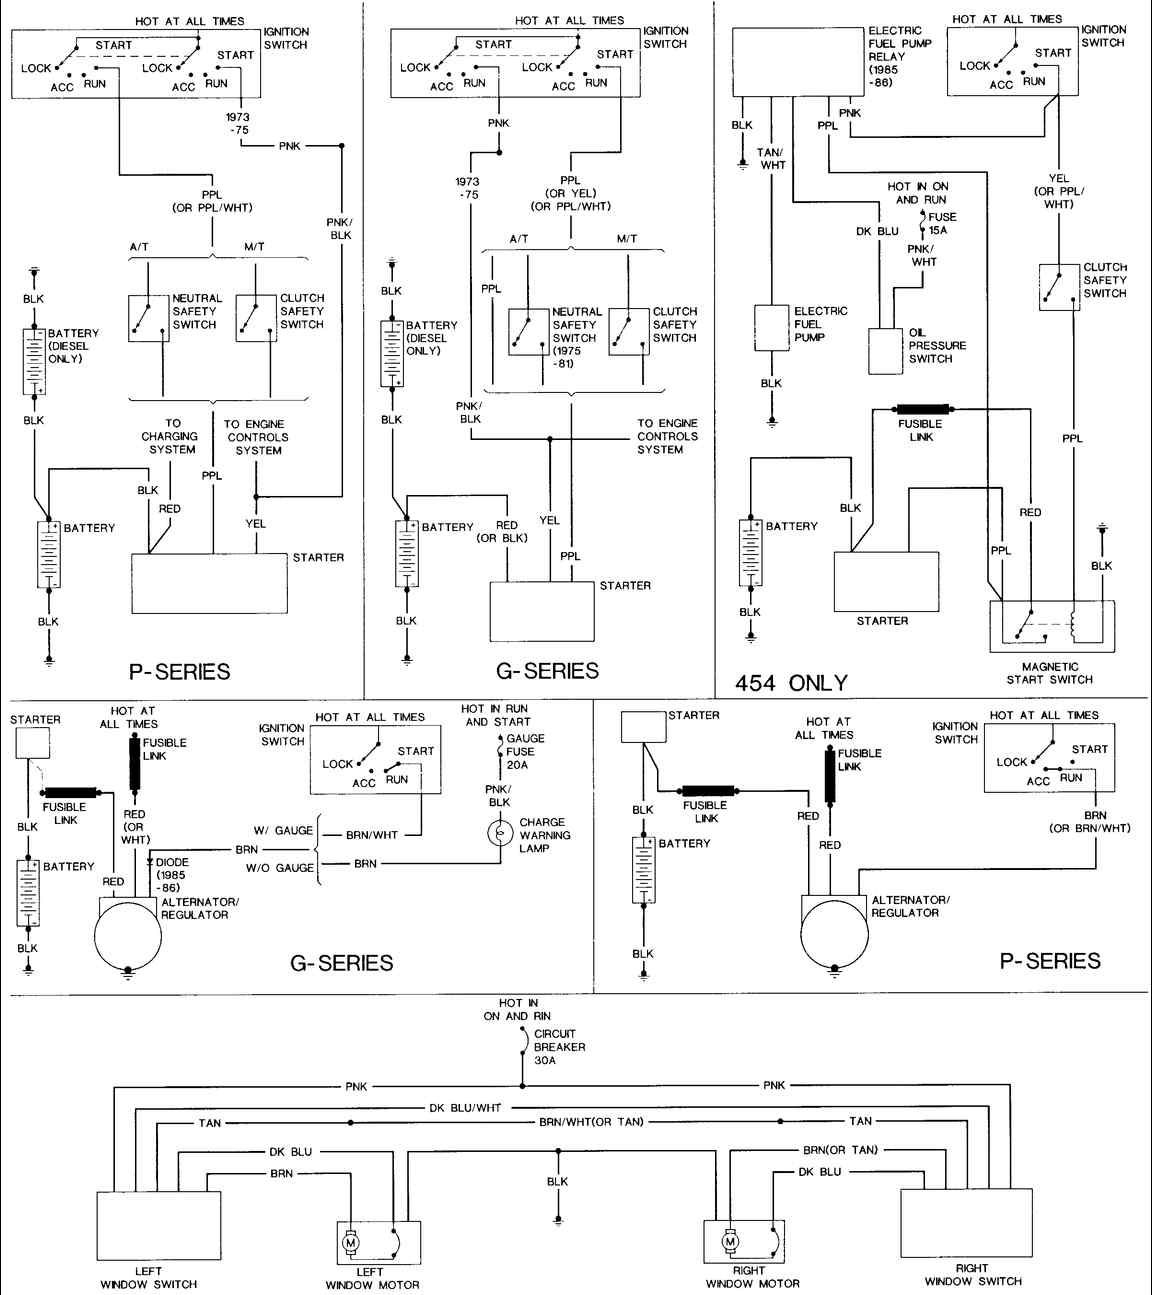 1984 Chevy Truck Alternator Wiring Diagram 2006 Gmc Sierra Bose Audio 85 Van The